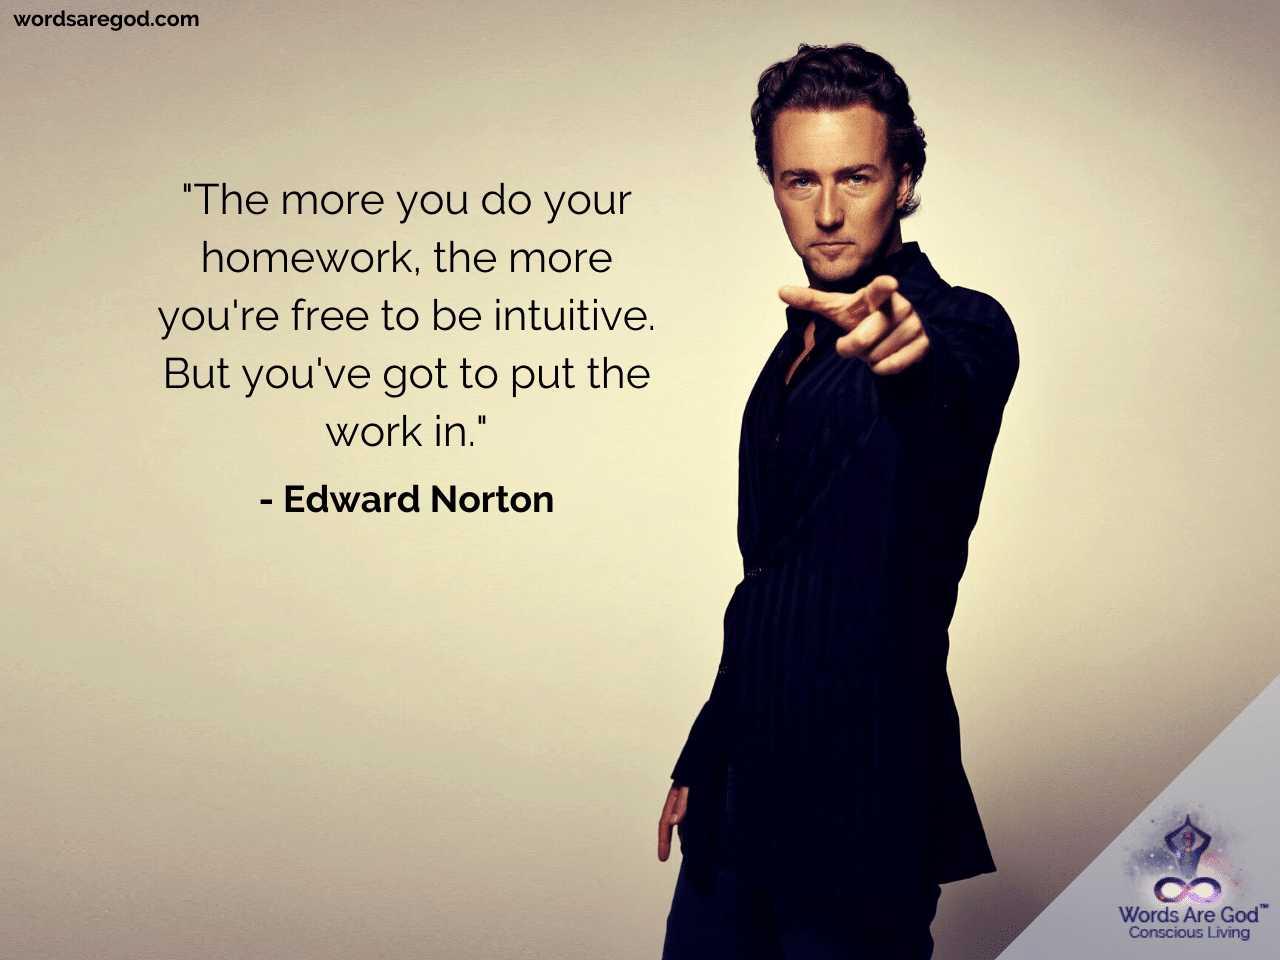 Edward Norton Best Quotes by Edward Norton